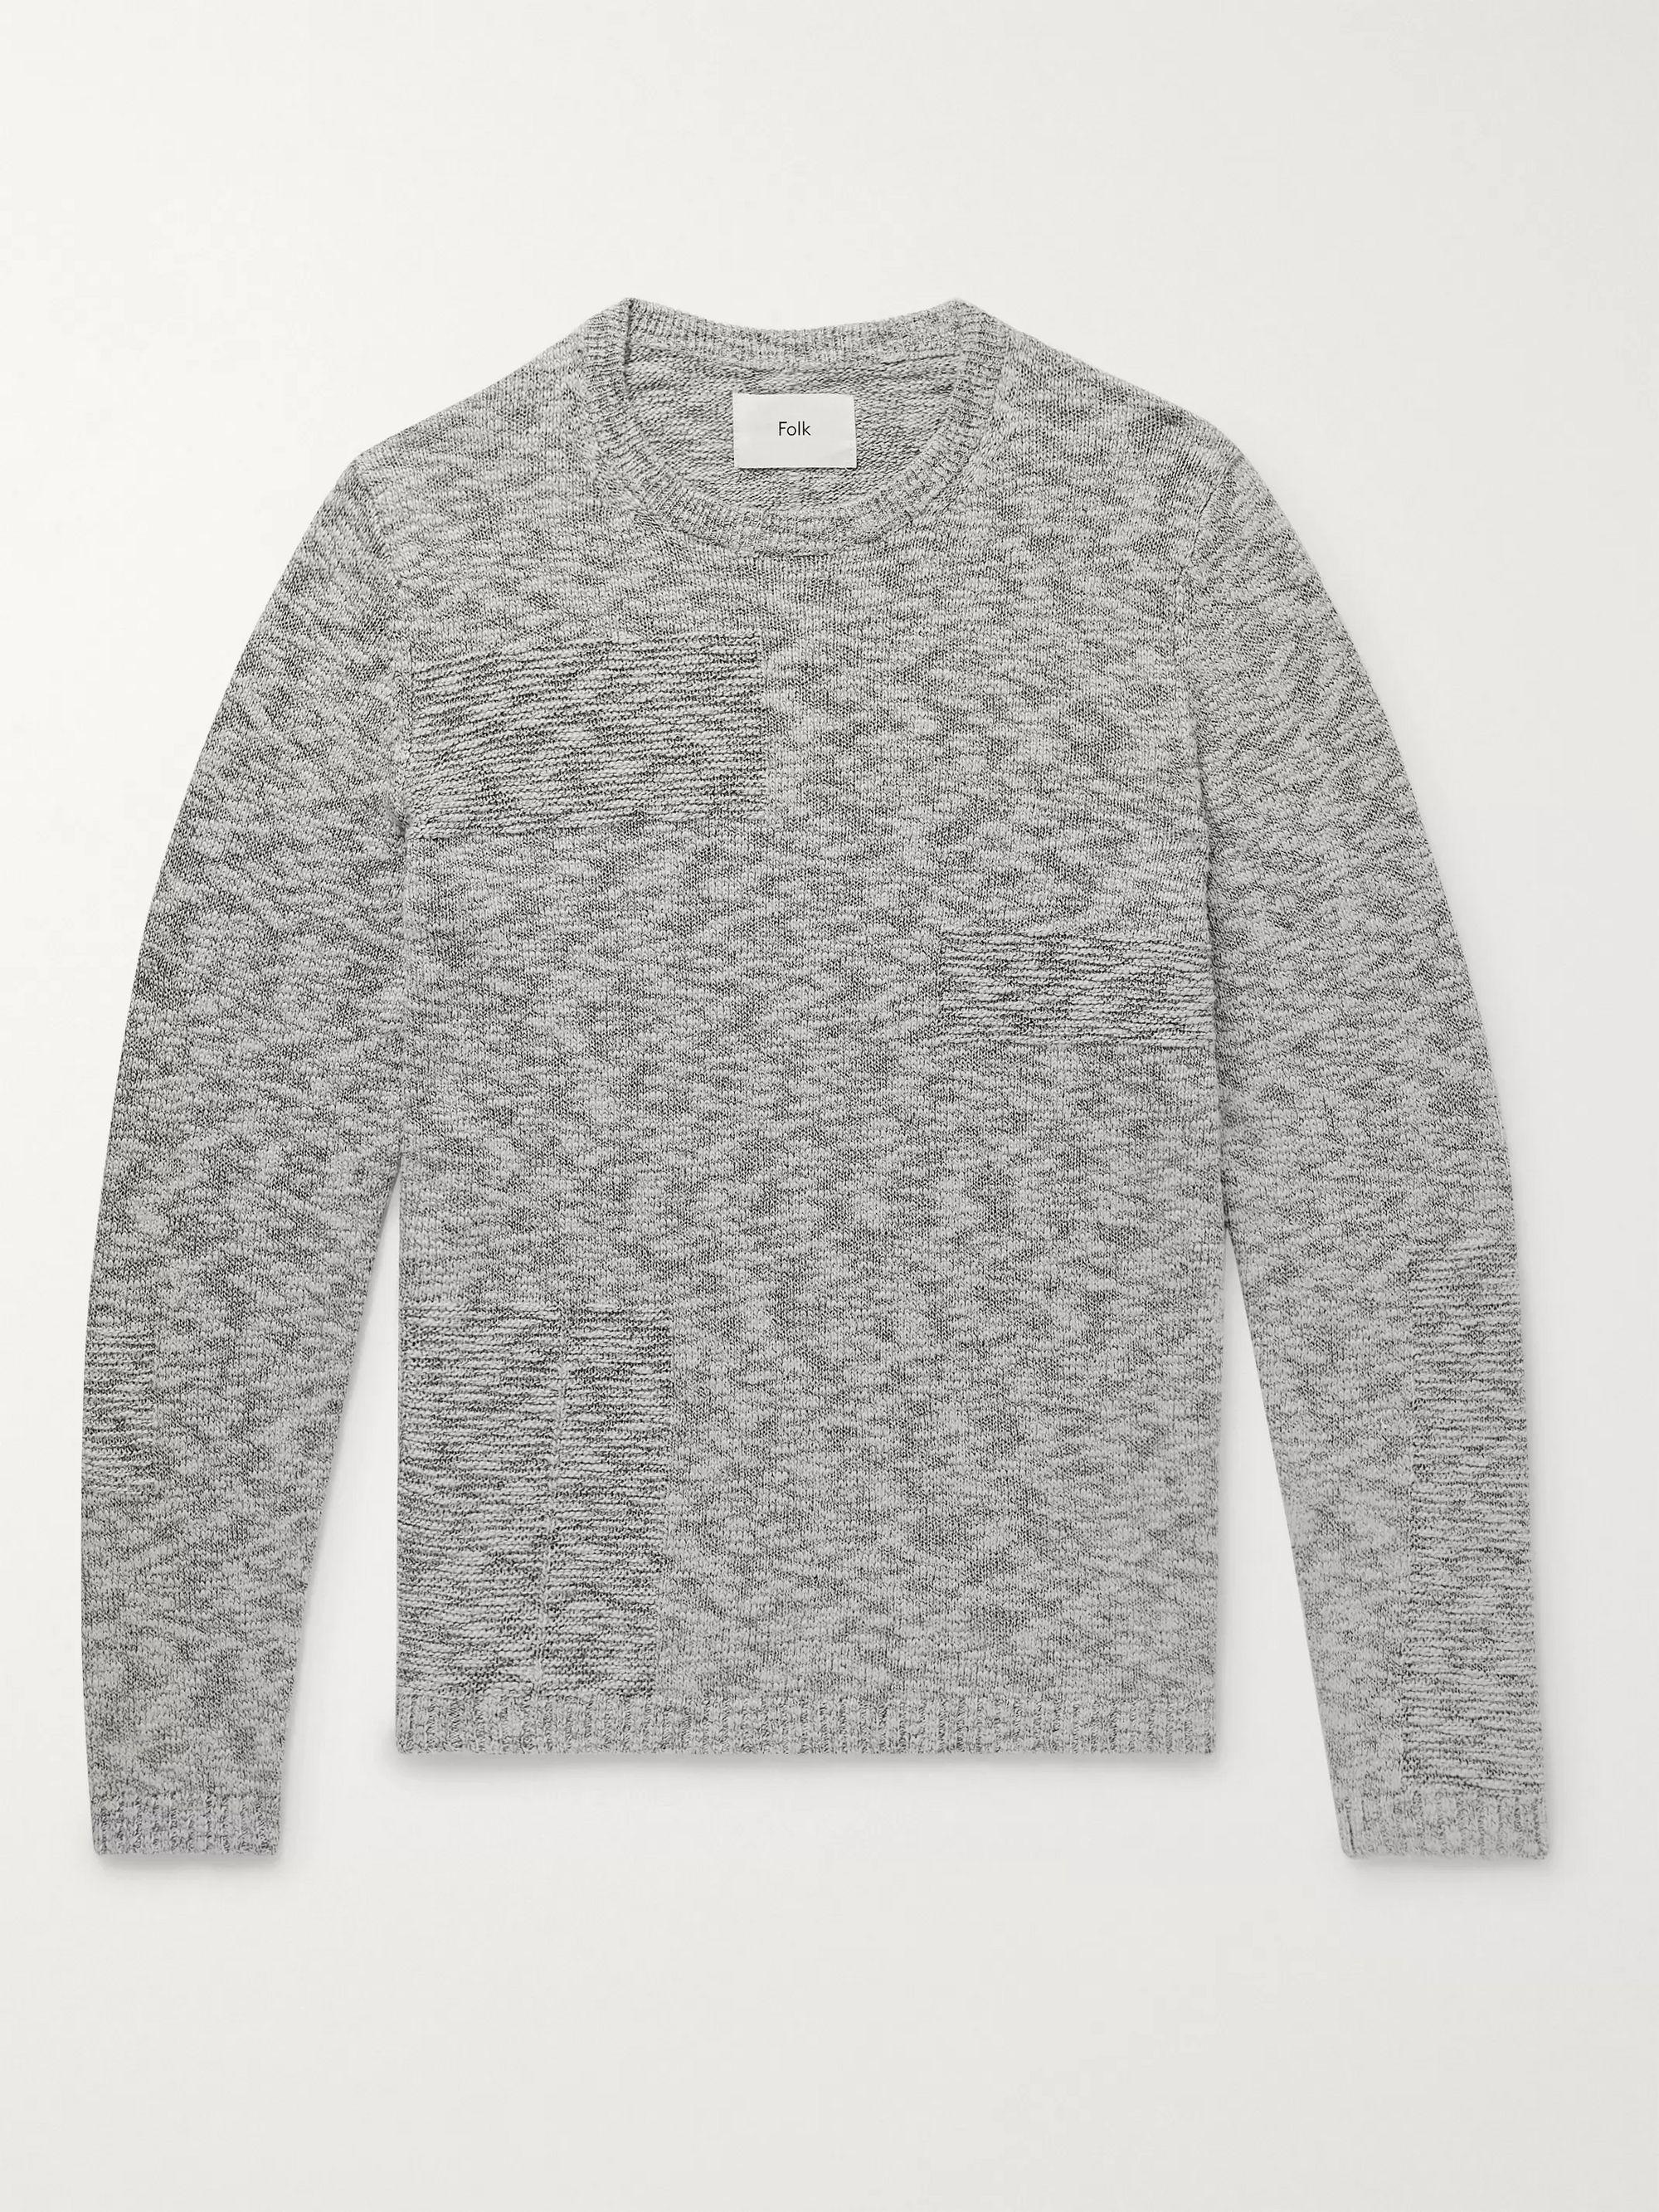 Folk Gray Slim-Fit Melange Cotton Sweater,Gray